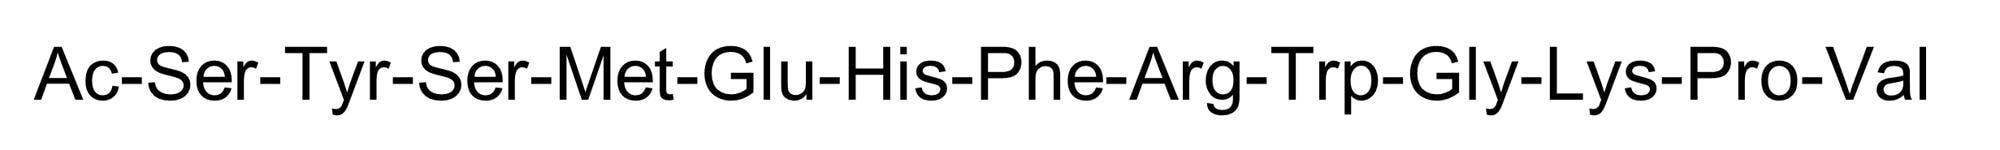 Chemical Structure - alpha-MSH (free acid), Endogenous melanocortin receptor agonist (ab120205)